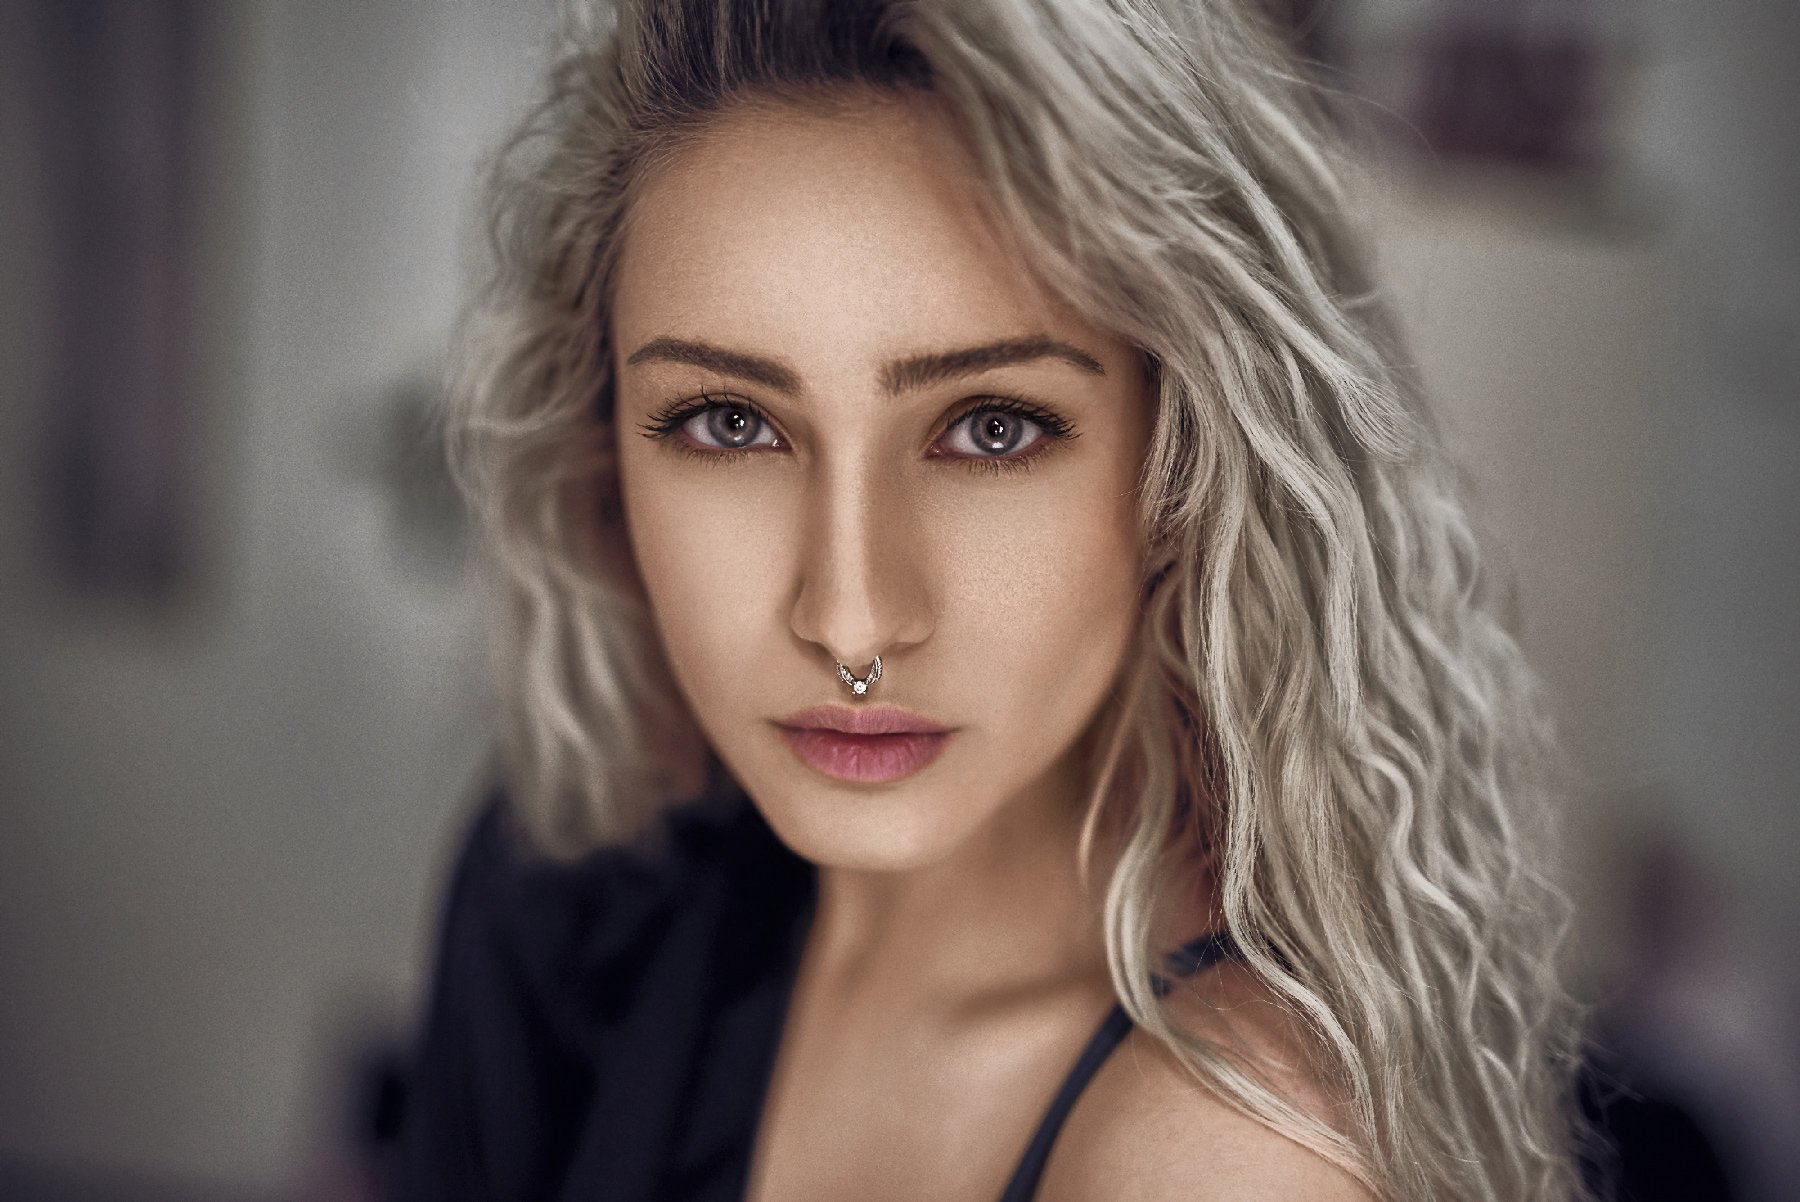 Portrait,girl,light,photo,Портрет, девушка,свет,фото,Модель,волосы,Кожа,Medis, Amirhossein kazemi